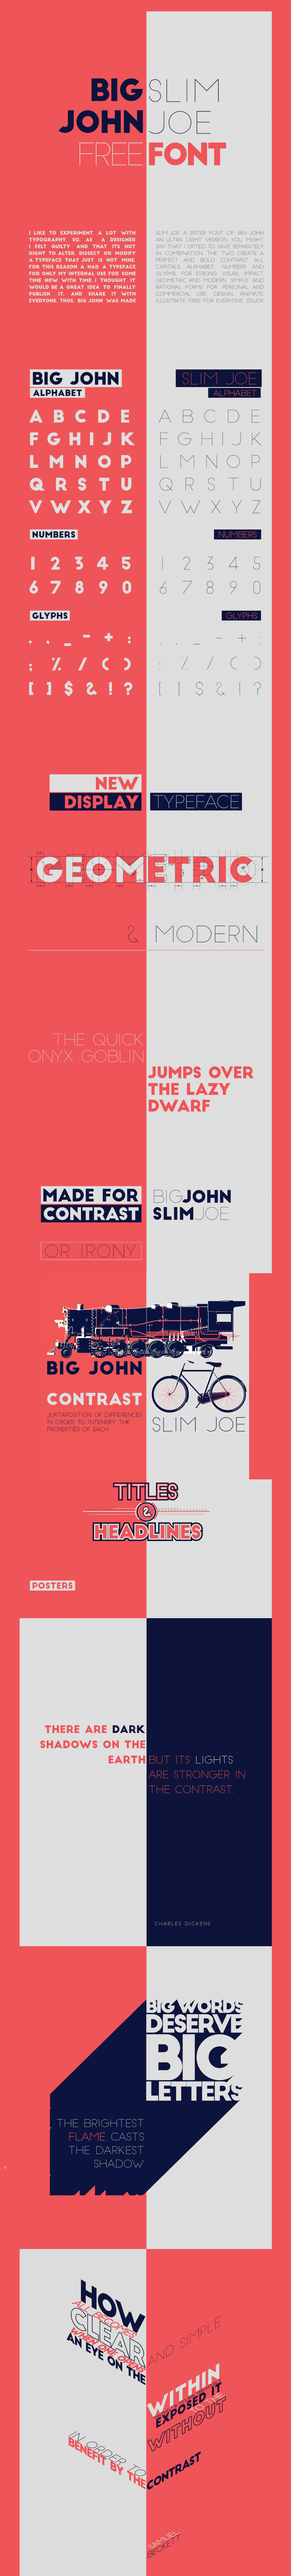 Big John _ Slim Joe - FREE Font on Behance